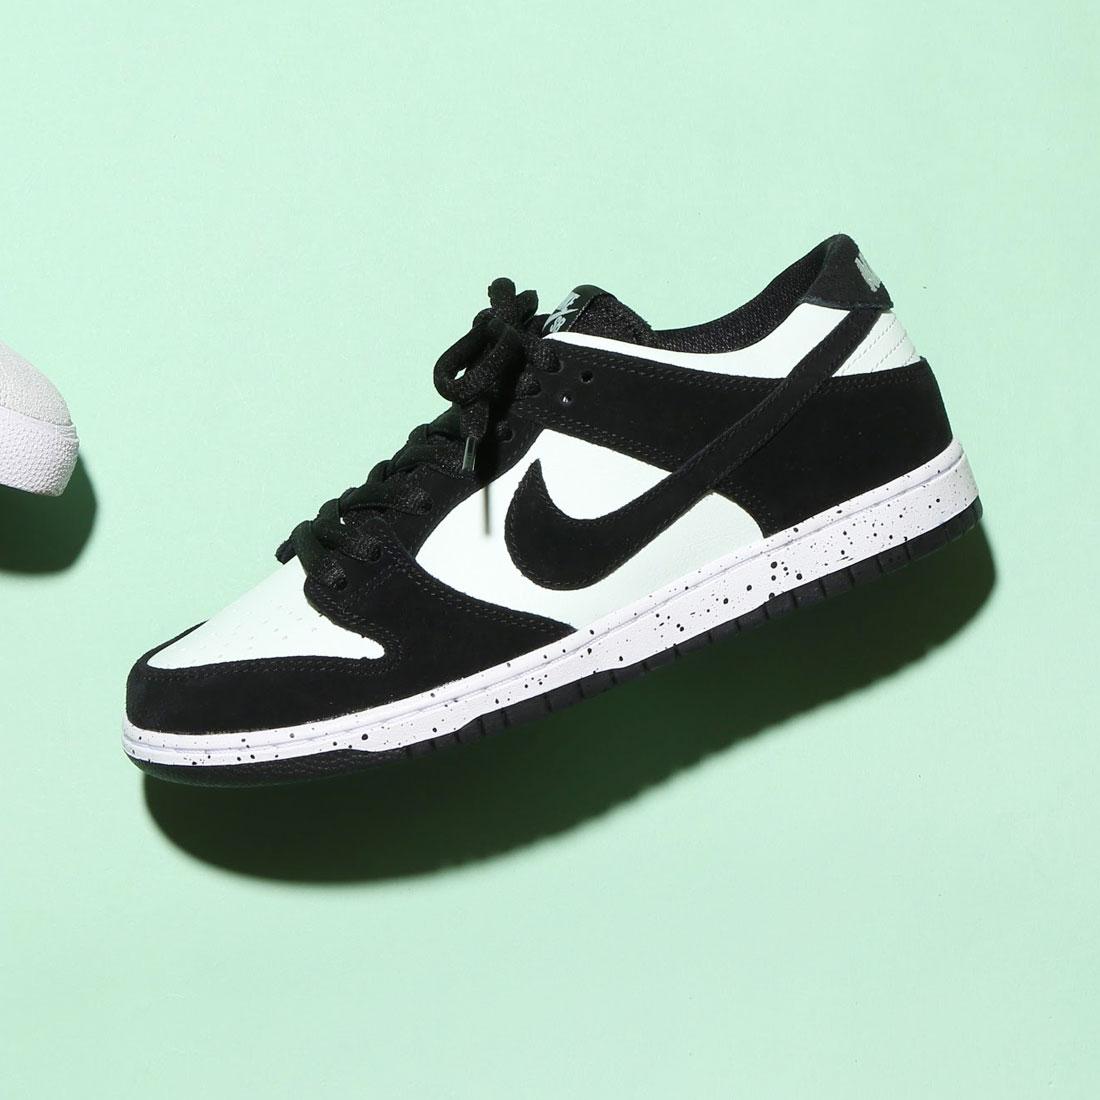 new style 8e9a9 88c5b NIKE SB ZOOM DUNK LOW PRO (Nike Nike SB zoom dunk low pro) (BLACK BLACK-BARELY  GREEN-WHITE) 17FA-S